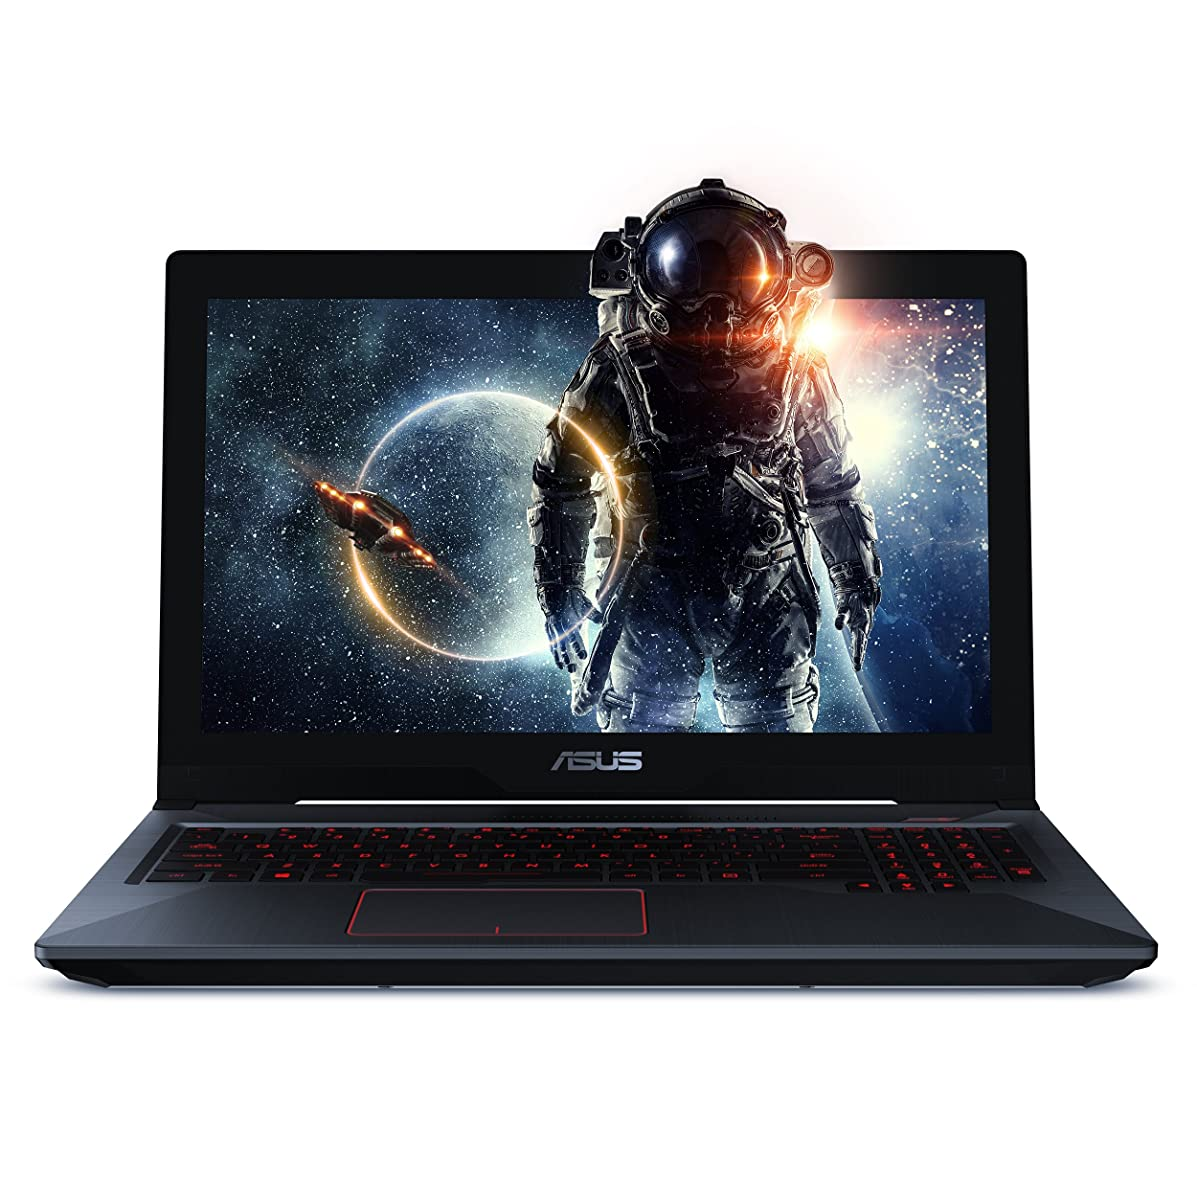 "ASUS FX503 Powerful Gaming Laptop, 15.6"" Full HD, Intel Core i5-7300HQ Quad-Core Processor, GeForce GTX 1050, 8GB DDR4, 1TB FireCuda SSHD, Windows 10 Home – FX503VD-WH51"